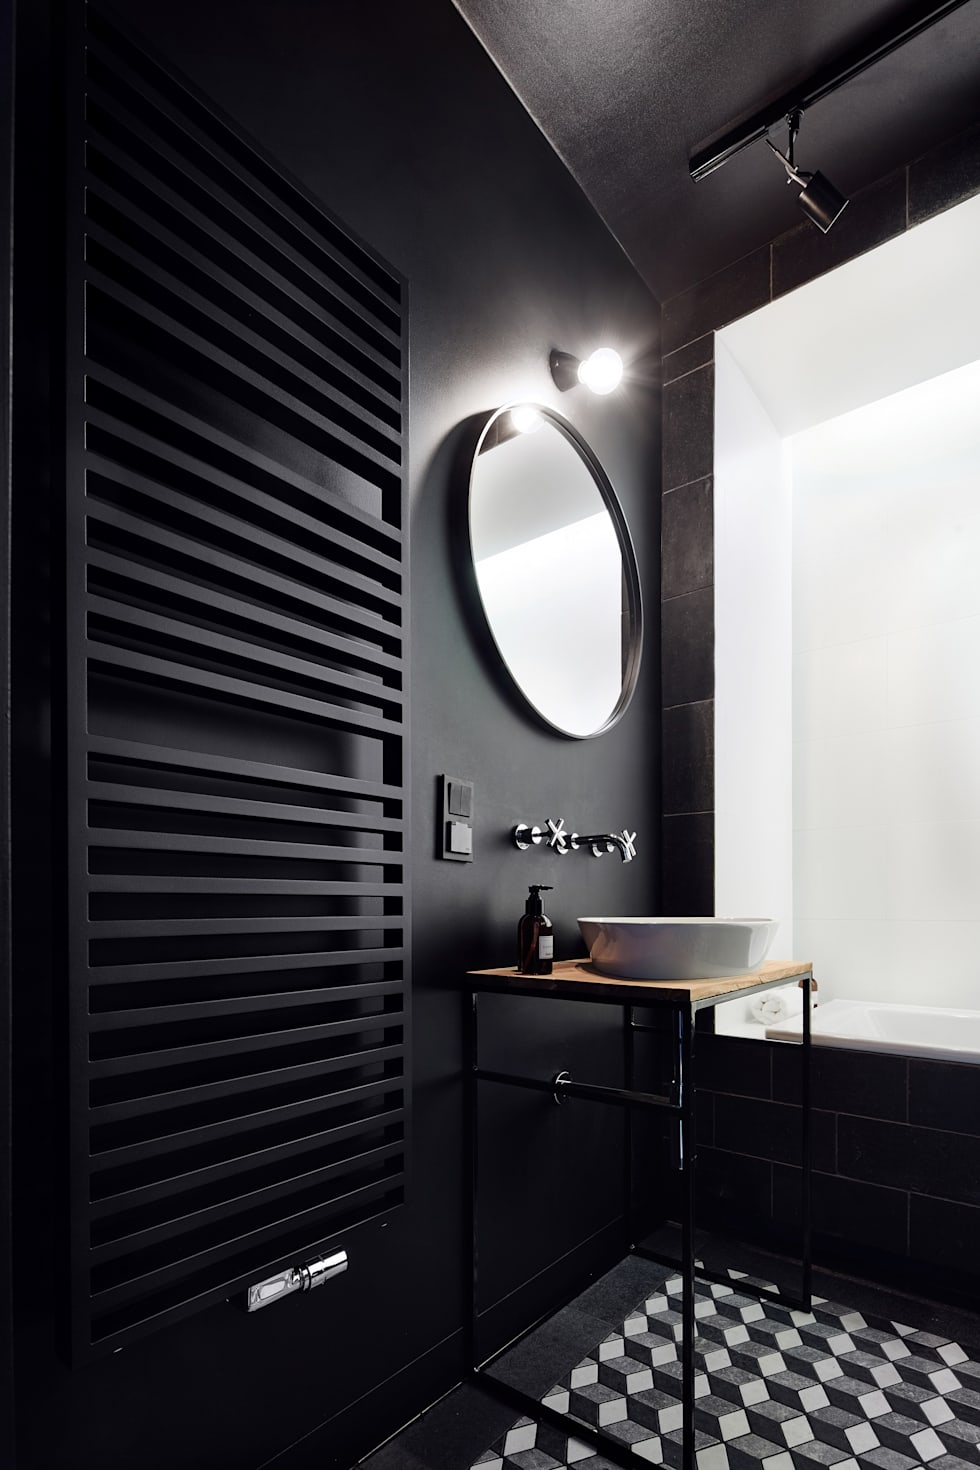 Image result for modern black interior house